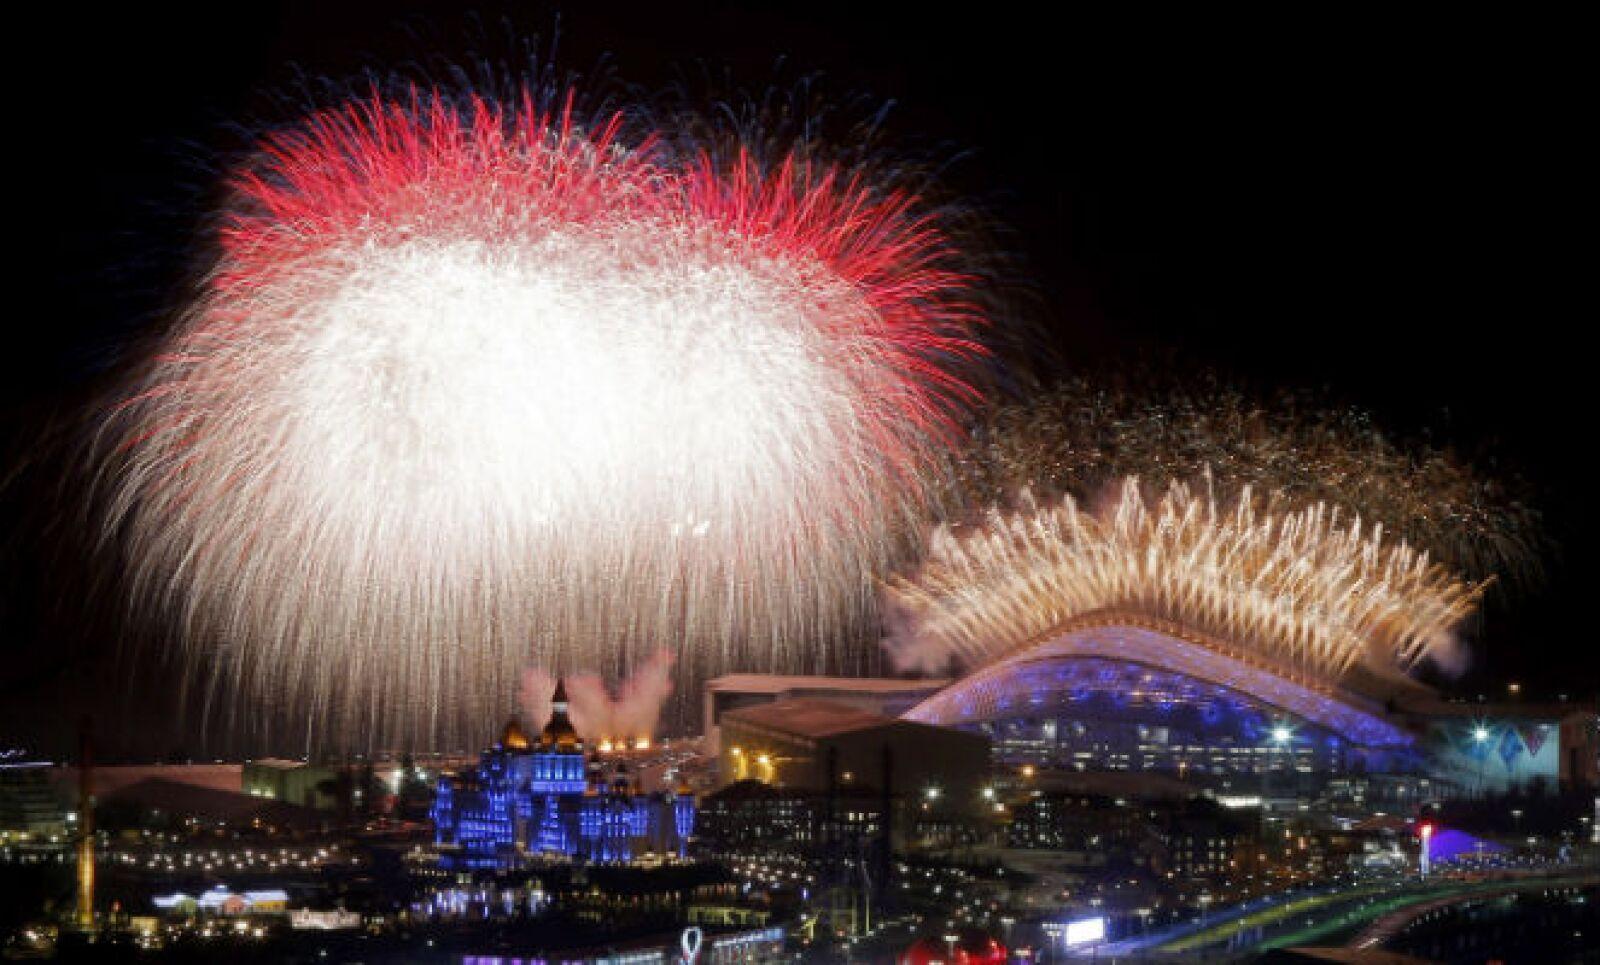 Un total de 2,850 atletas competirán en Sochi 2014.